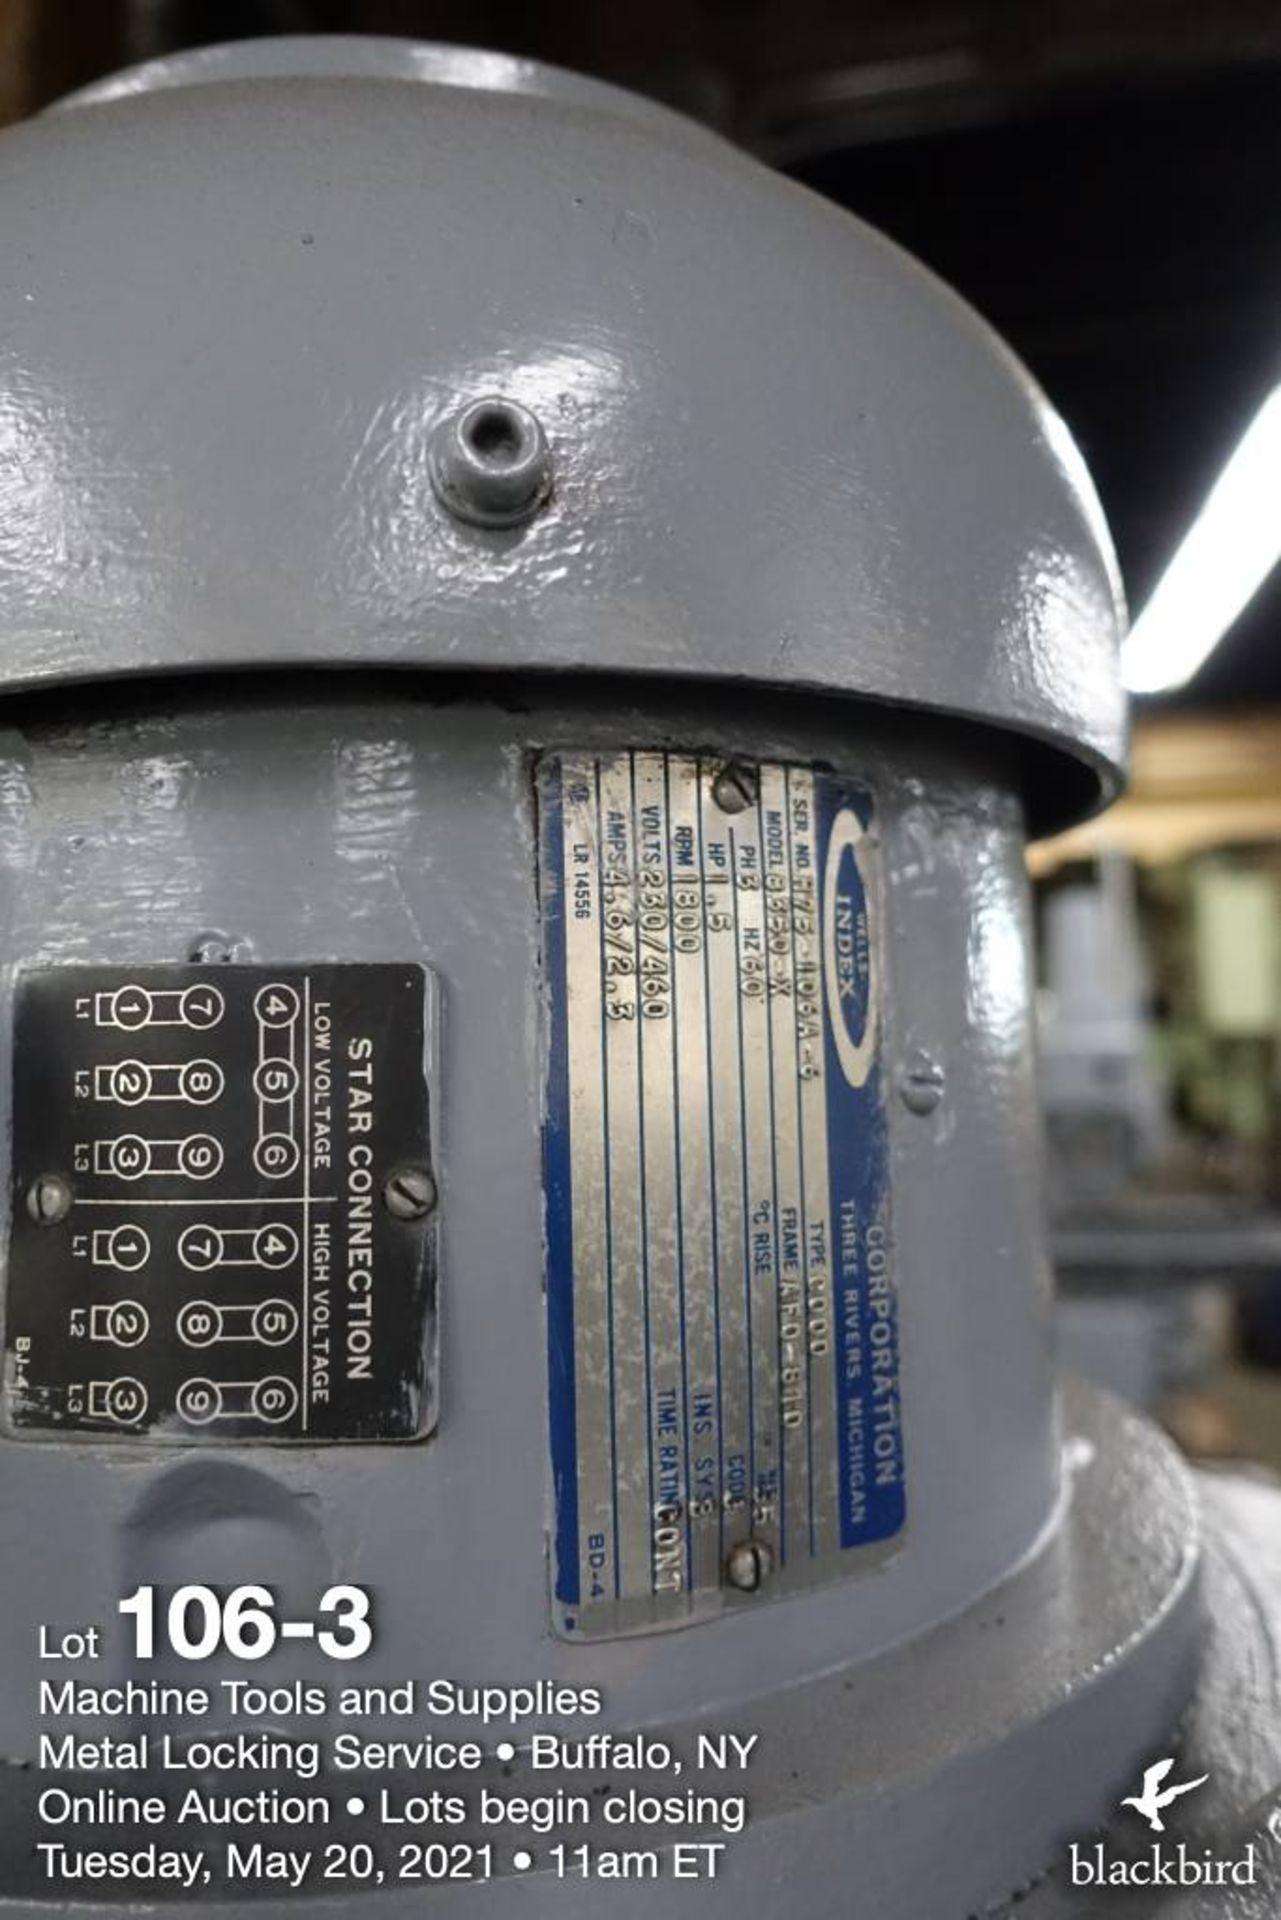 Wells Index 747 vertical milling machine, 1.5 HP - Image 4 of 5